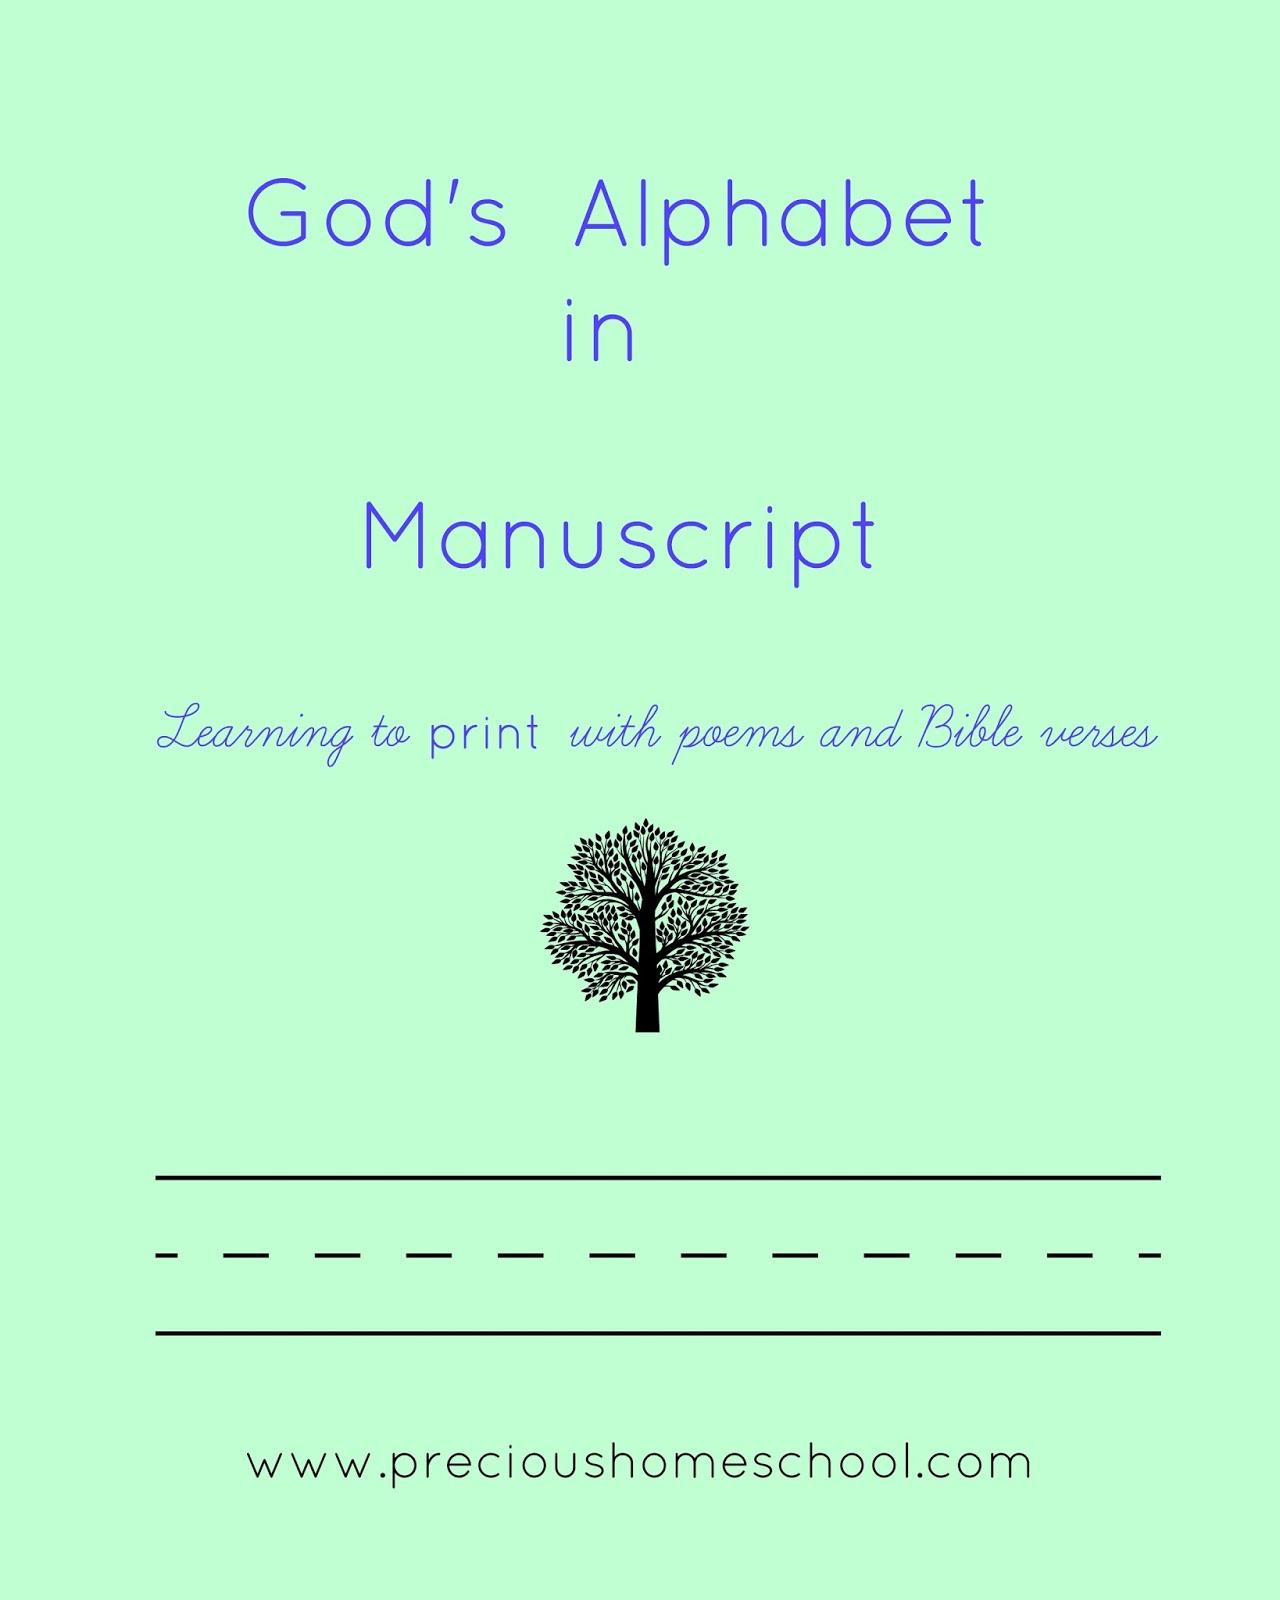 Precious Homeschool: Manuscript Writing Curriculum